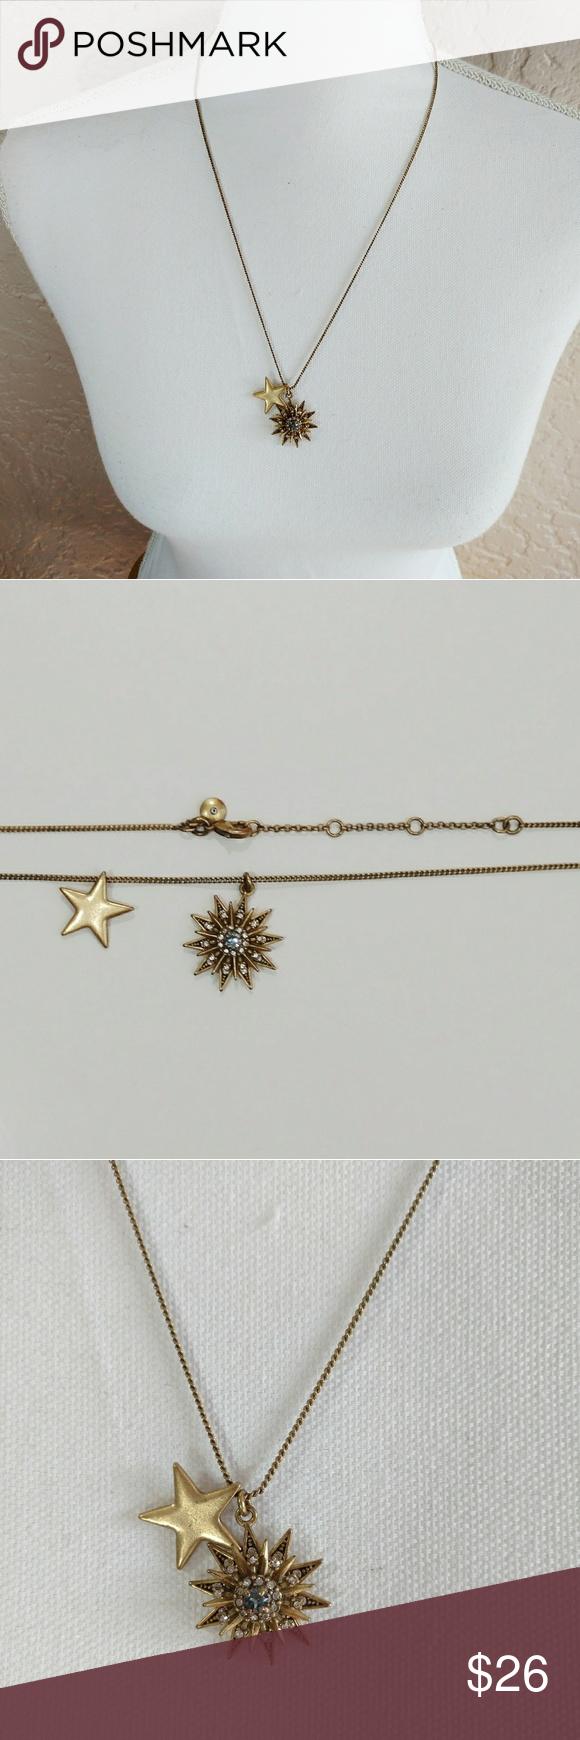 J crew sun u star pendant necklace pinterest